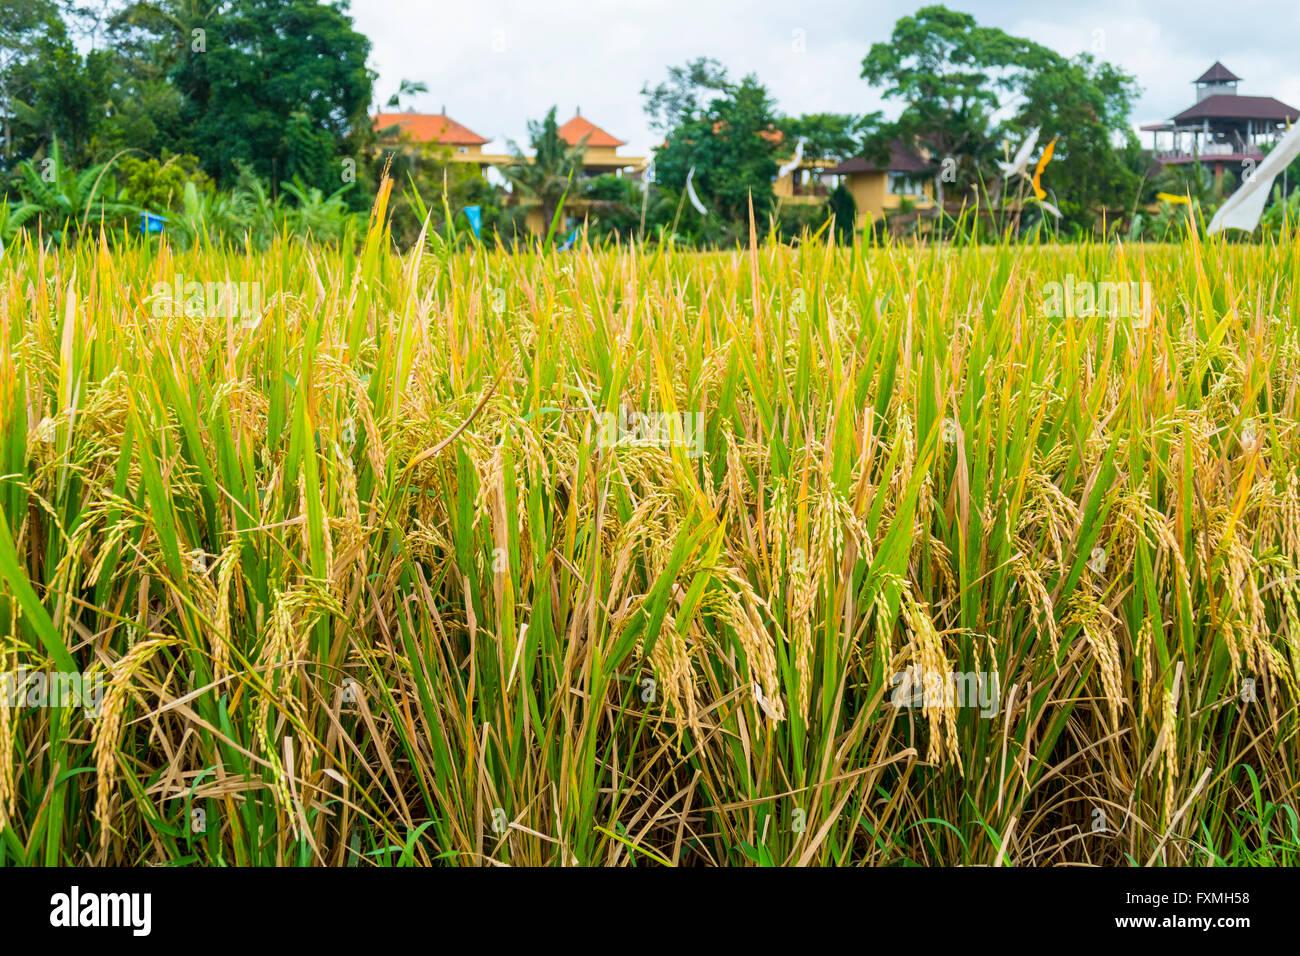 Rice Paddies, Ubud, Bali, Indonesia - Stock Image